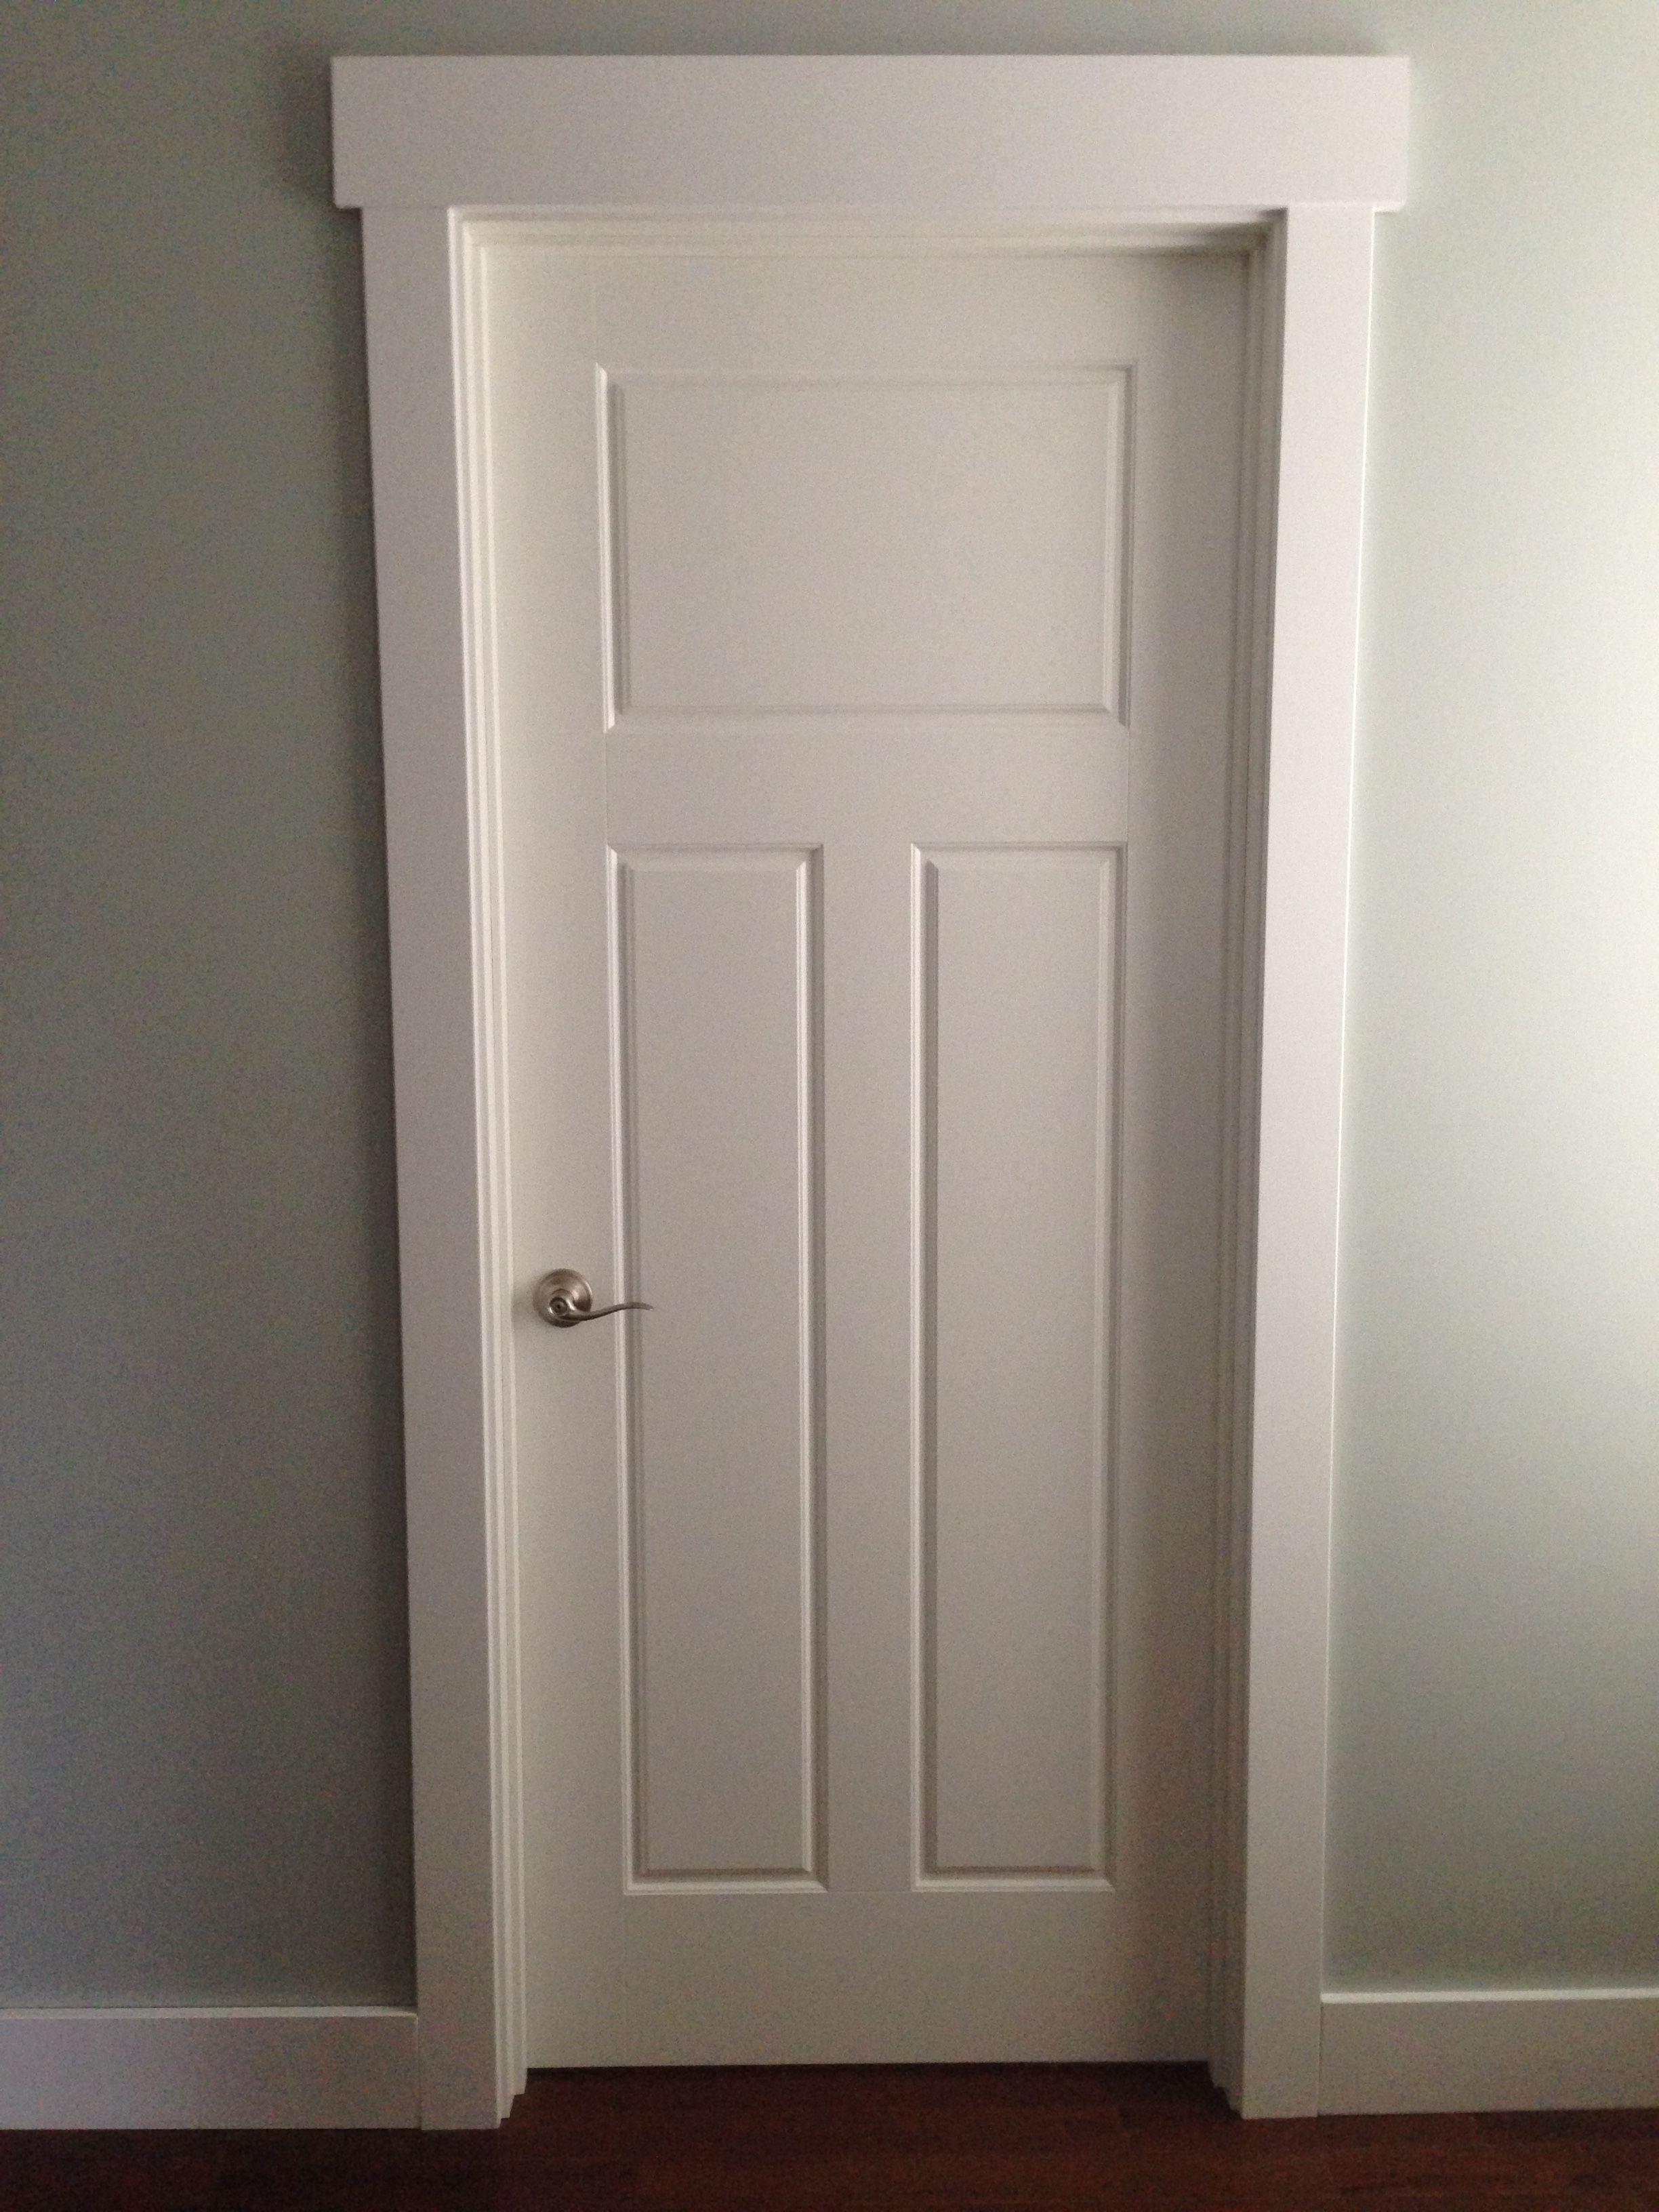 Craftsman style door casing.   Hardwood Mouldings in 2018 ...